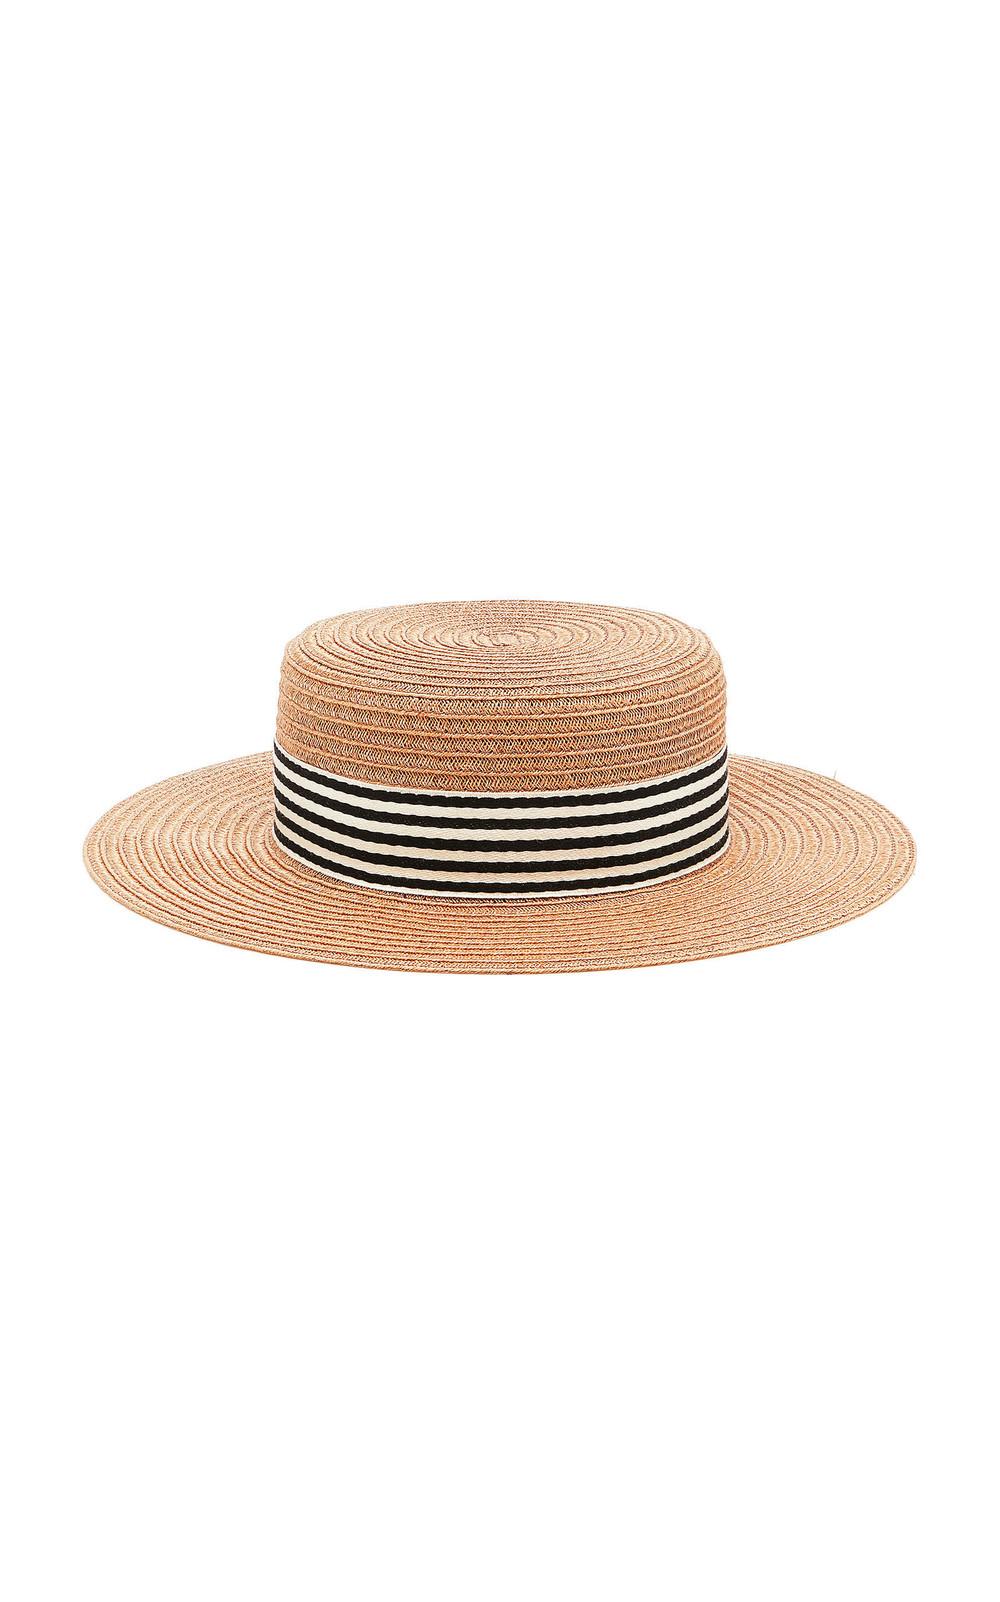 Eugenia Kim Brigitte Straw Hat in neutral